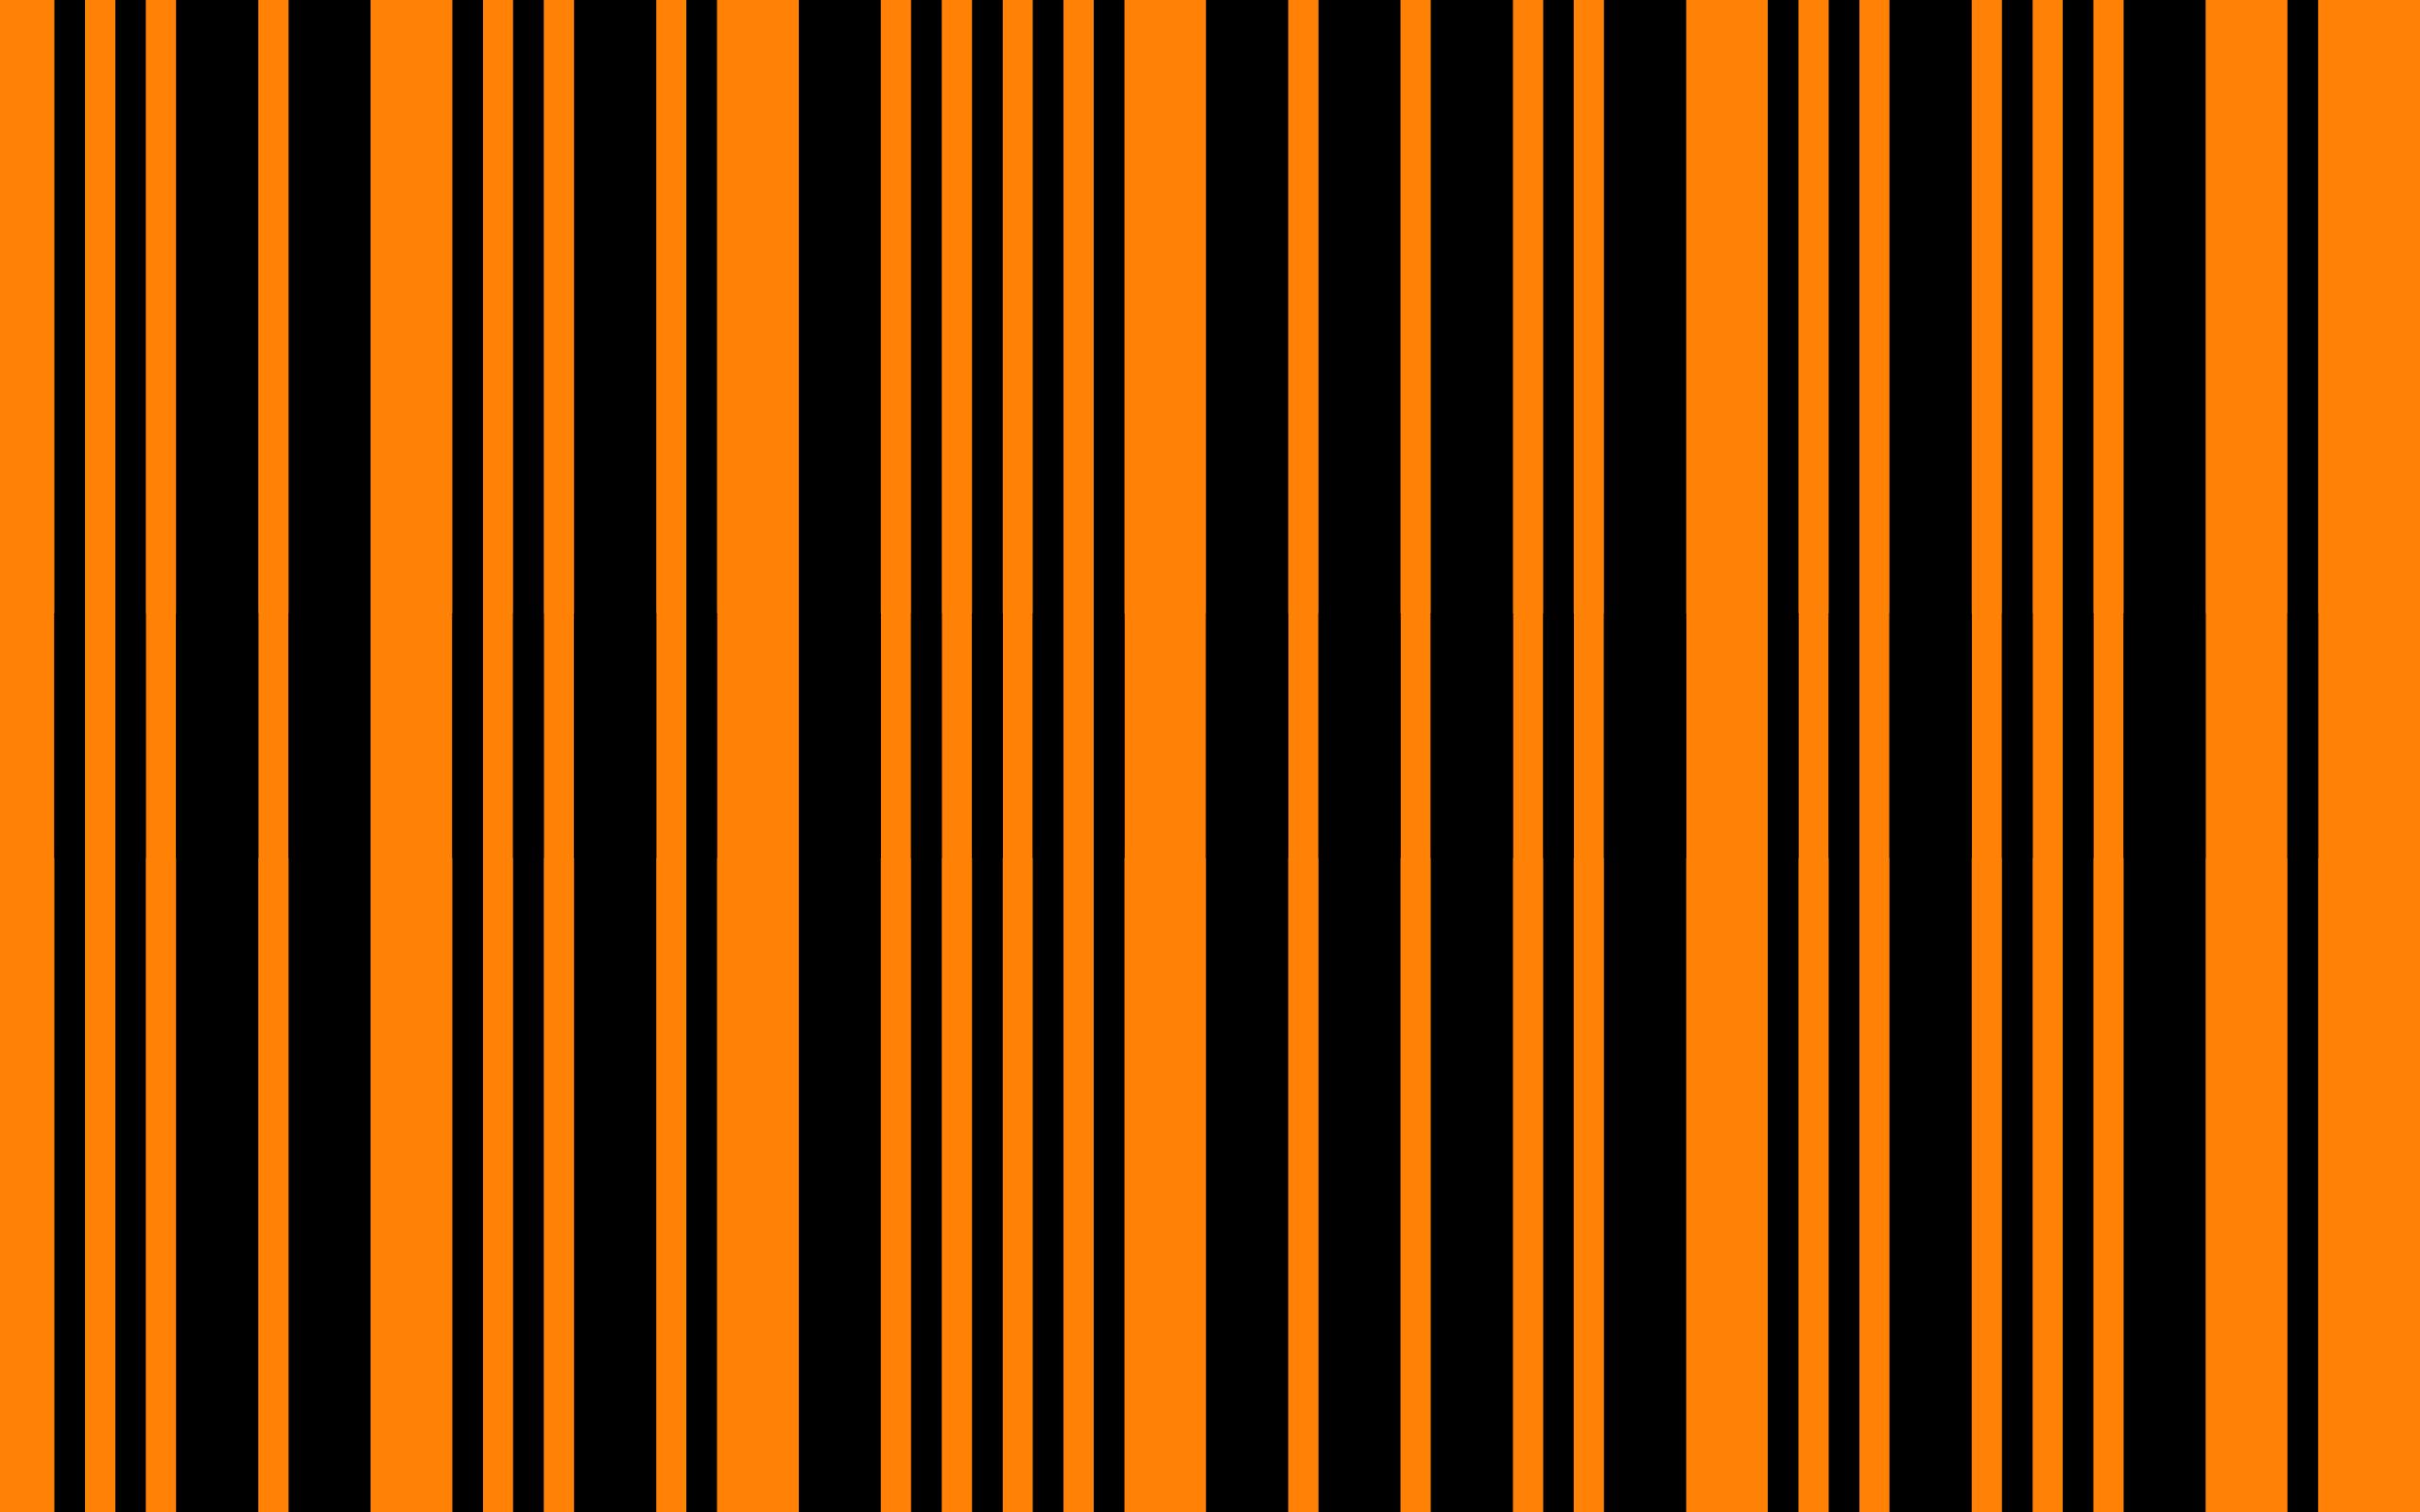 Orange bar code on a black background wallpapers and images orange bar code on a black background voltagebd Image collections